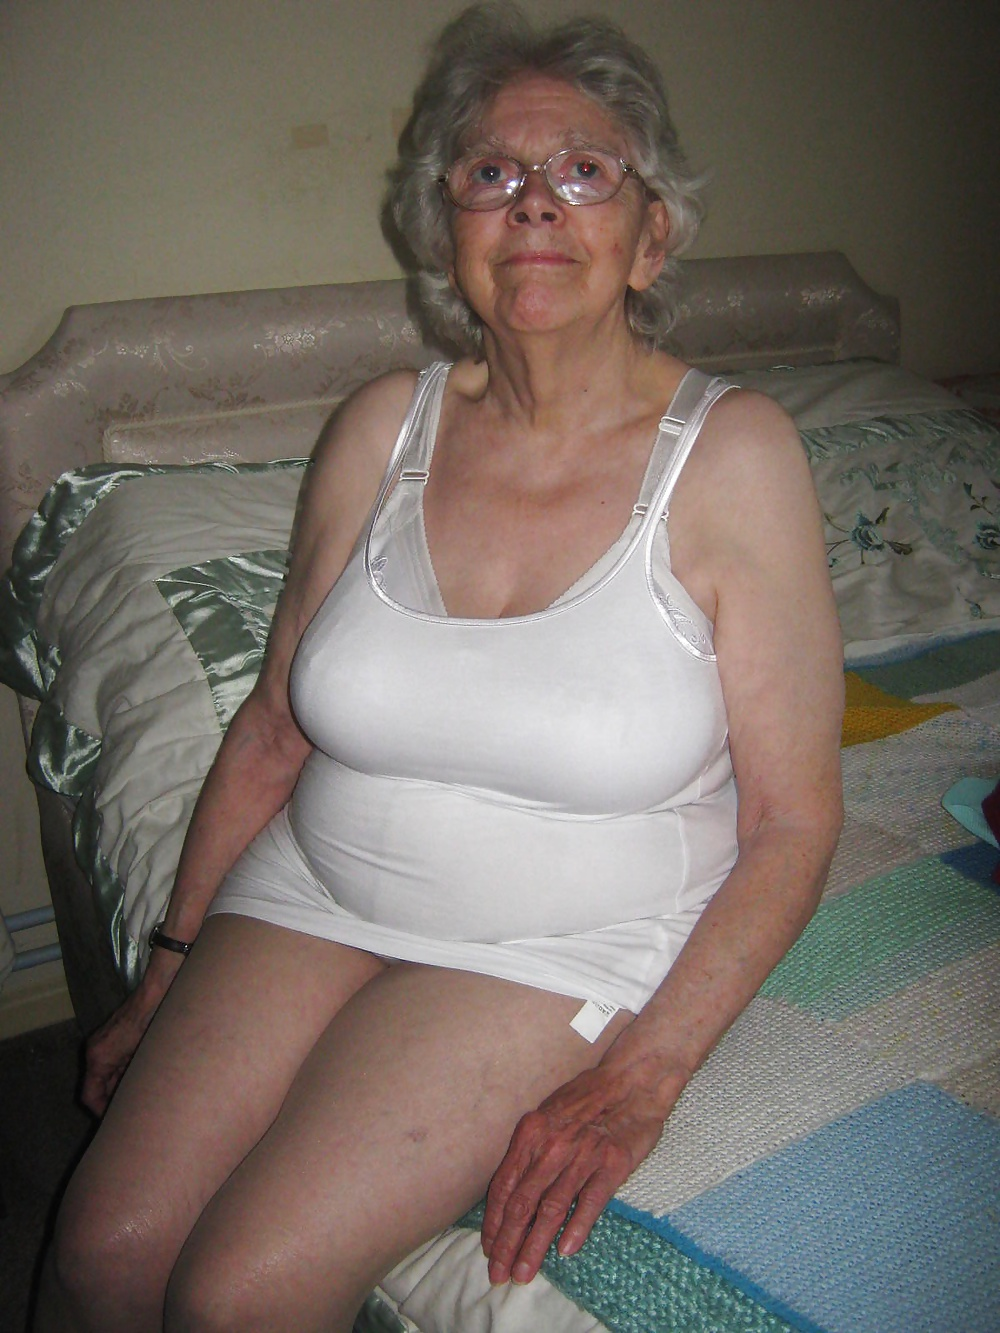 Sheila 80 Year Old Slut Granny From Uk - 18 Pics  Xhamster-9705